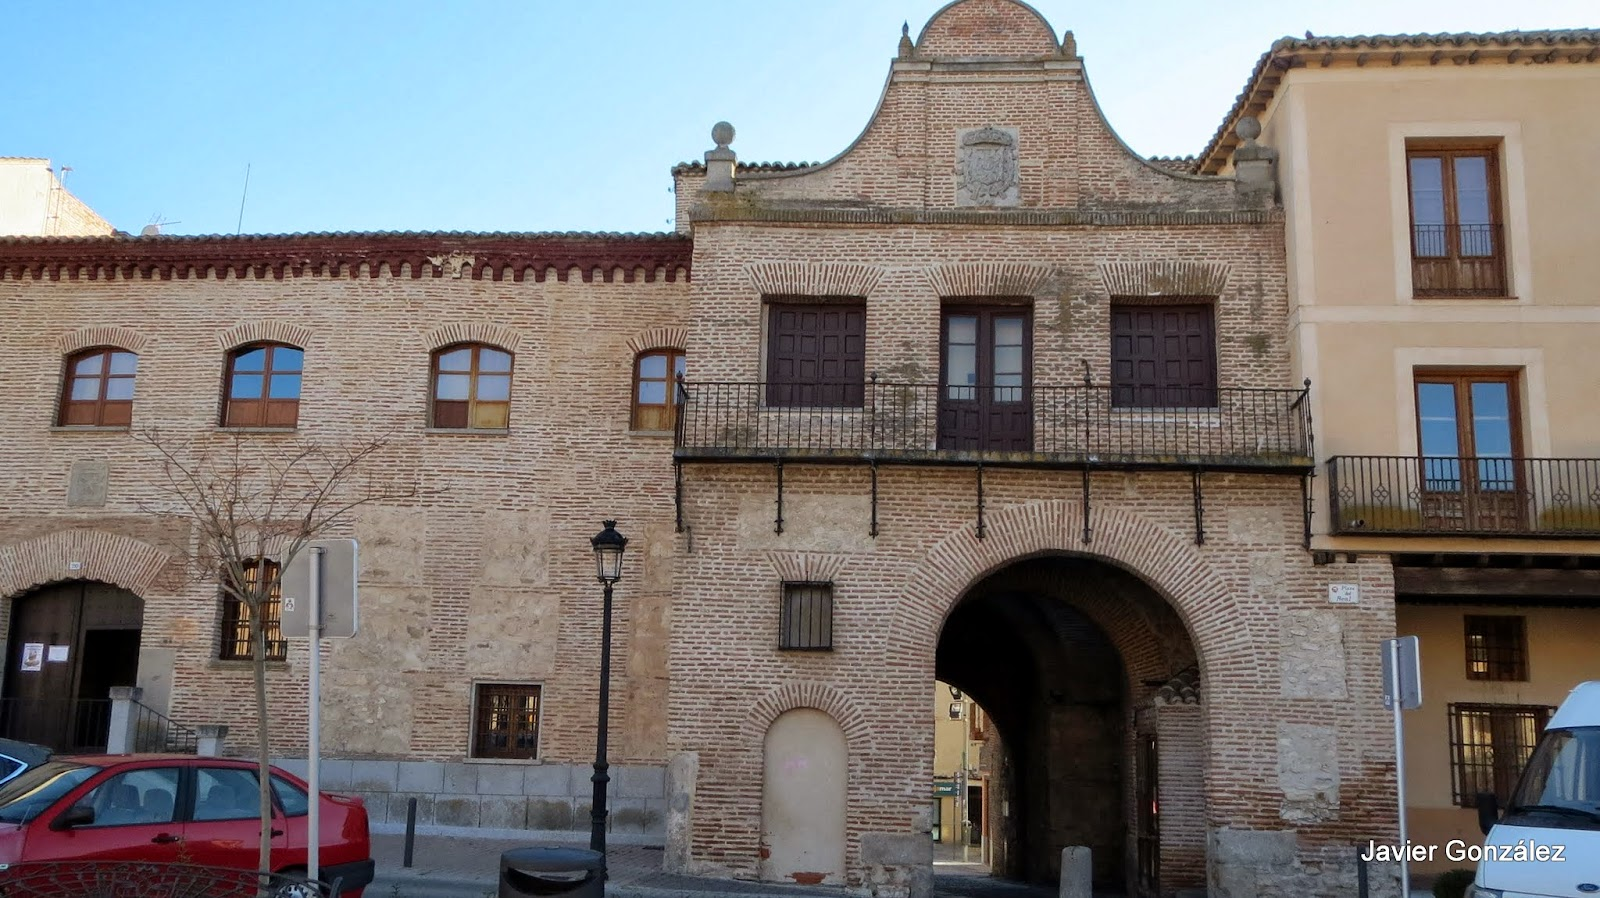 La Ruta de Isabel. Arévalo. Arco de Alcocer